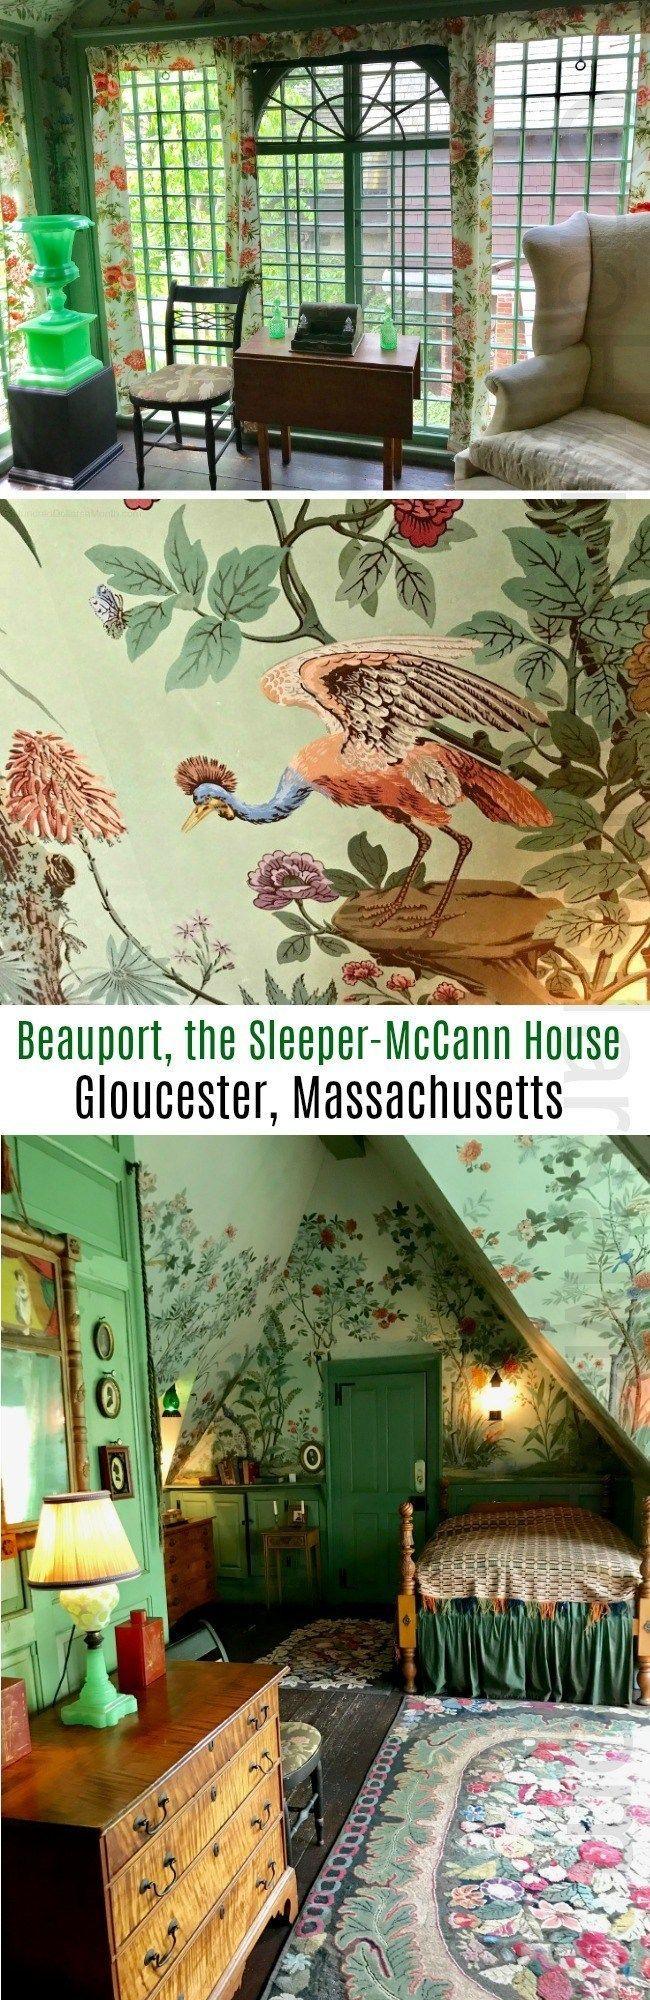 Beauport, the Sleeper-McCann House ~ Gloucester, Massachusetts